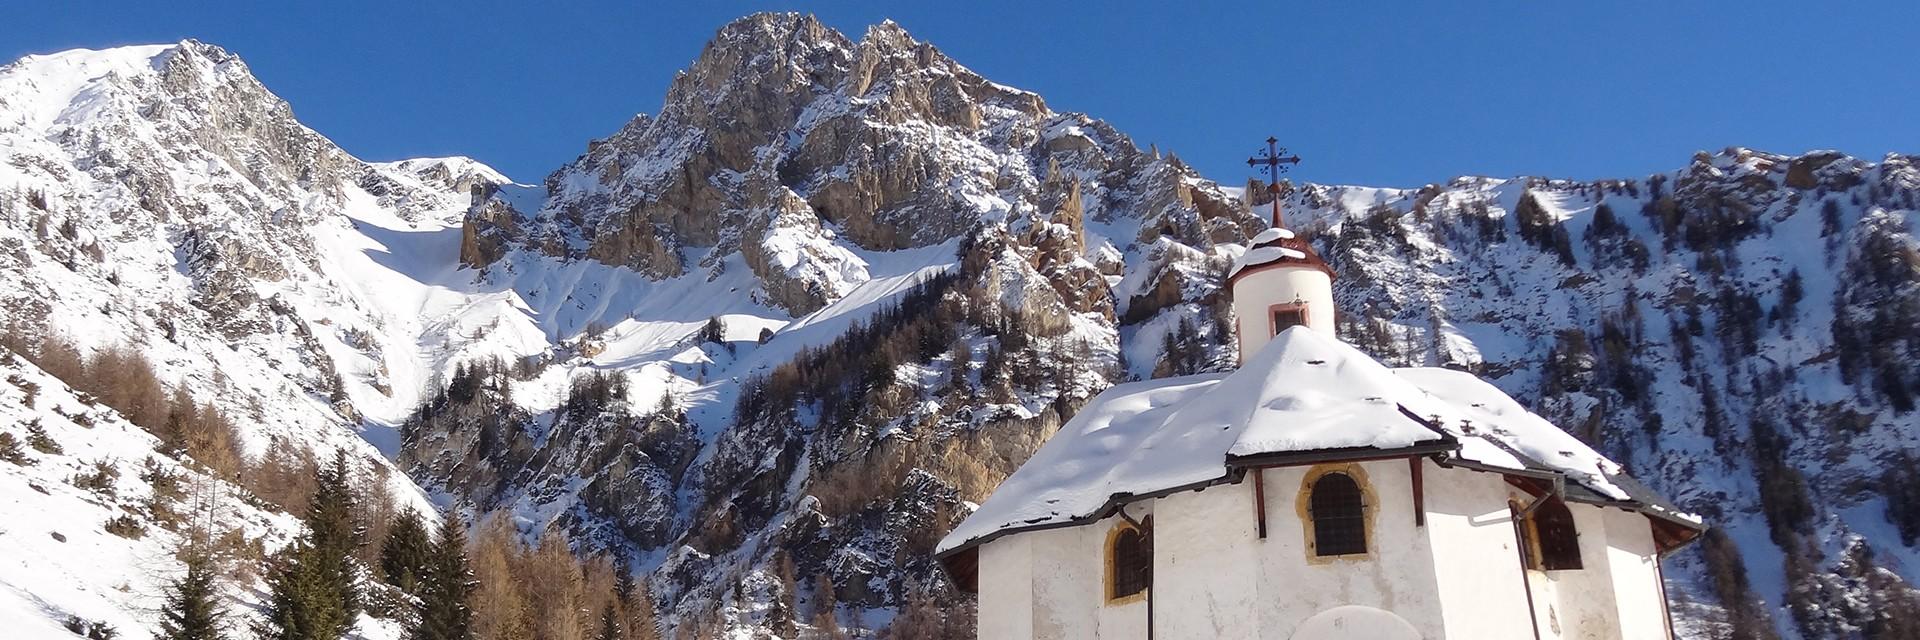 diaporama-hiver-6-1259